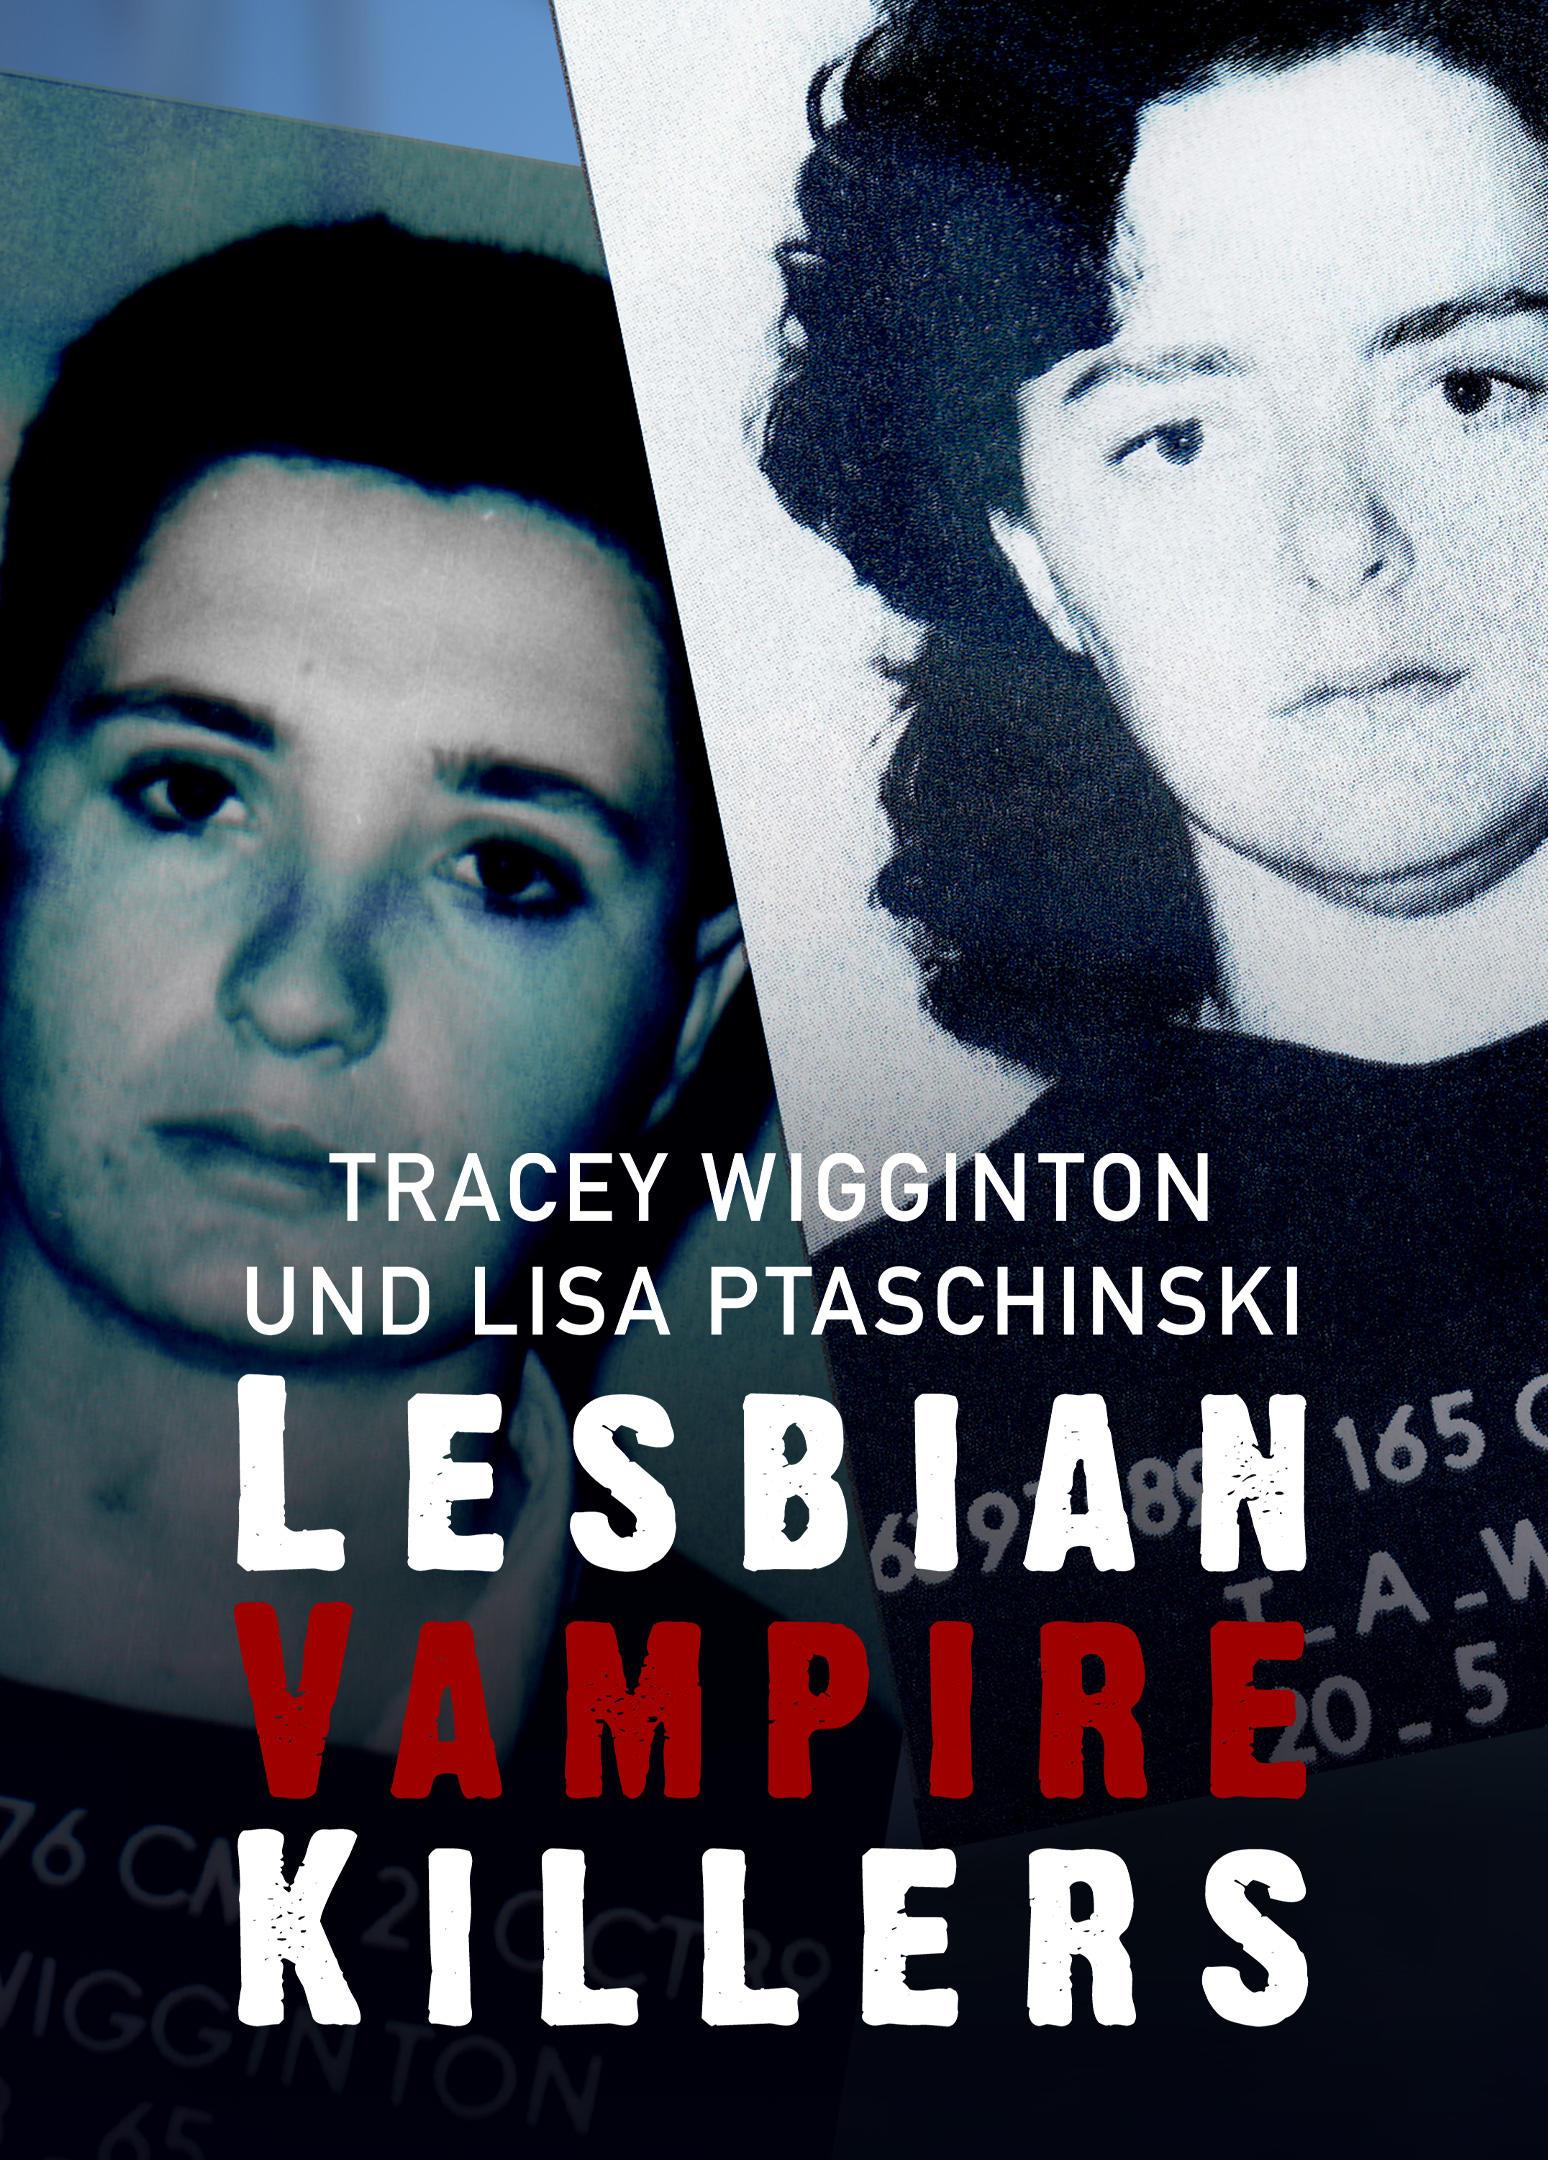 Tracey Wigginton und Lisa Ptaschinski: Lesbian Vampire Killers